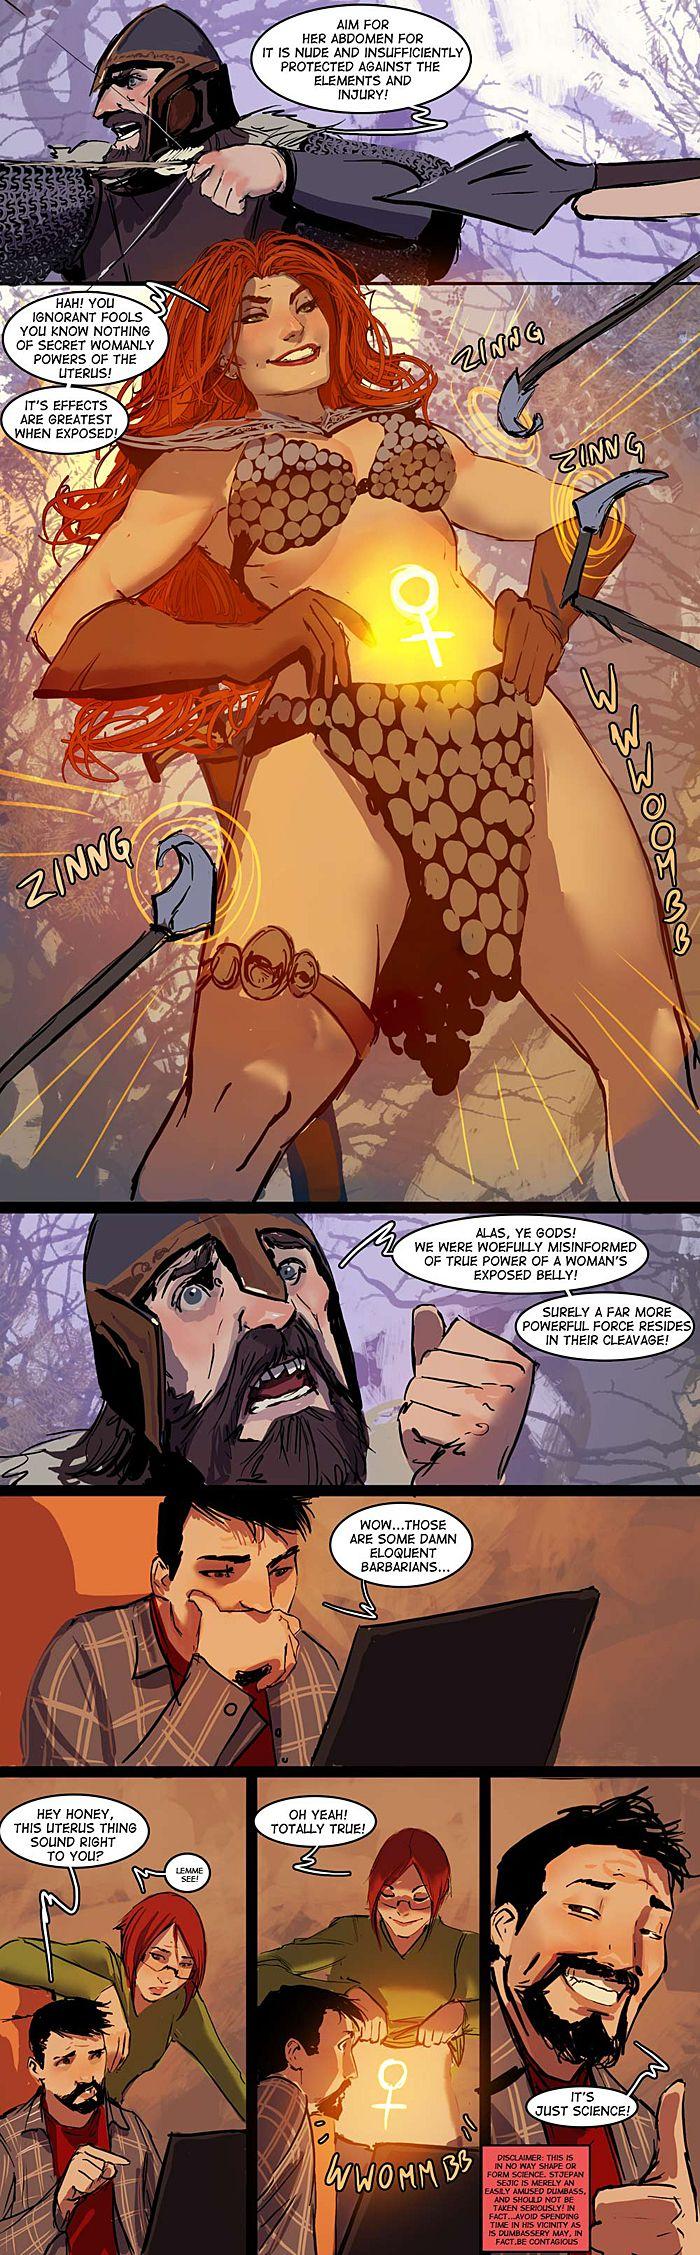 Female Armor Explained!  Womb Power Comic